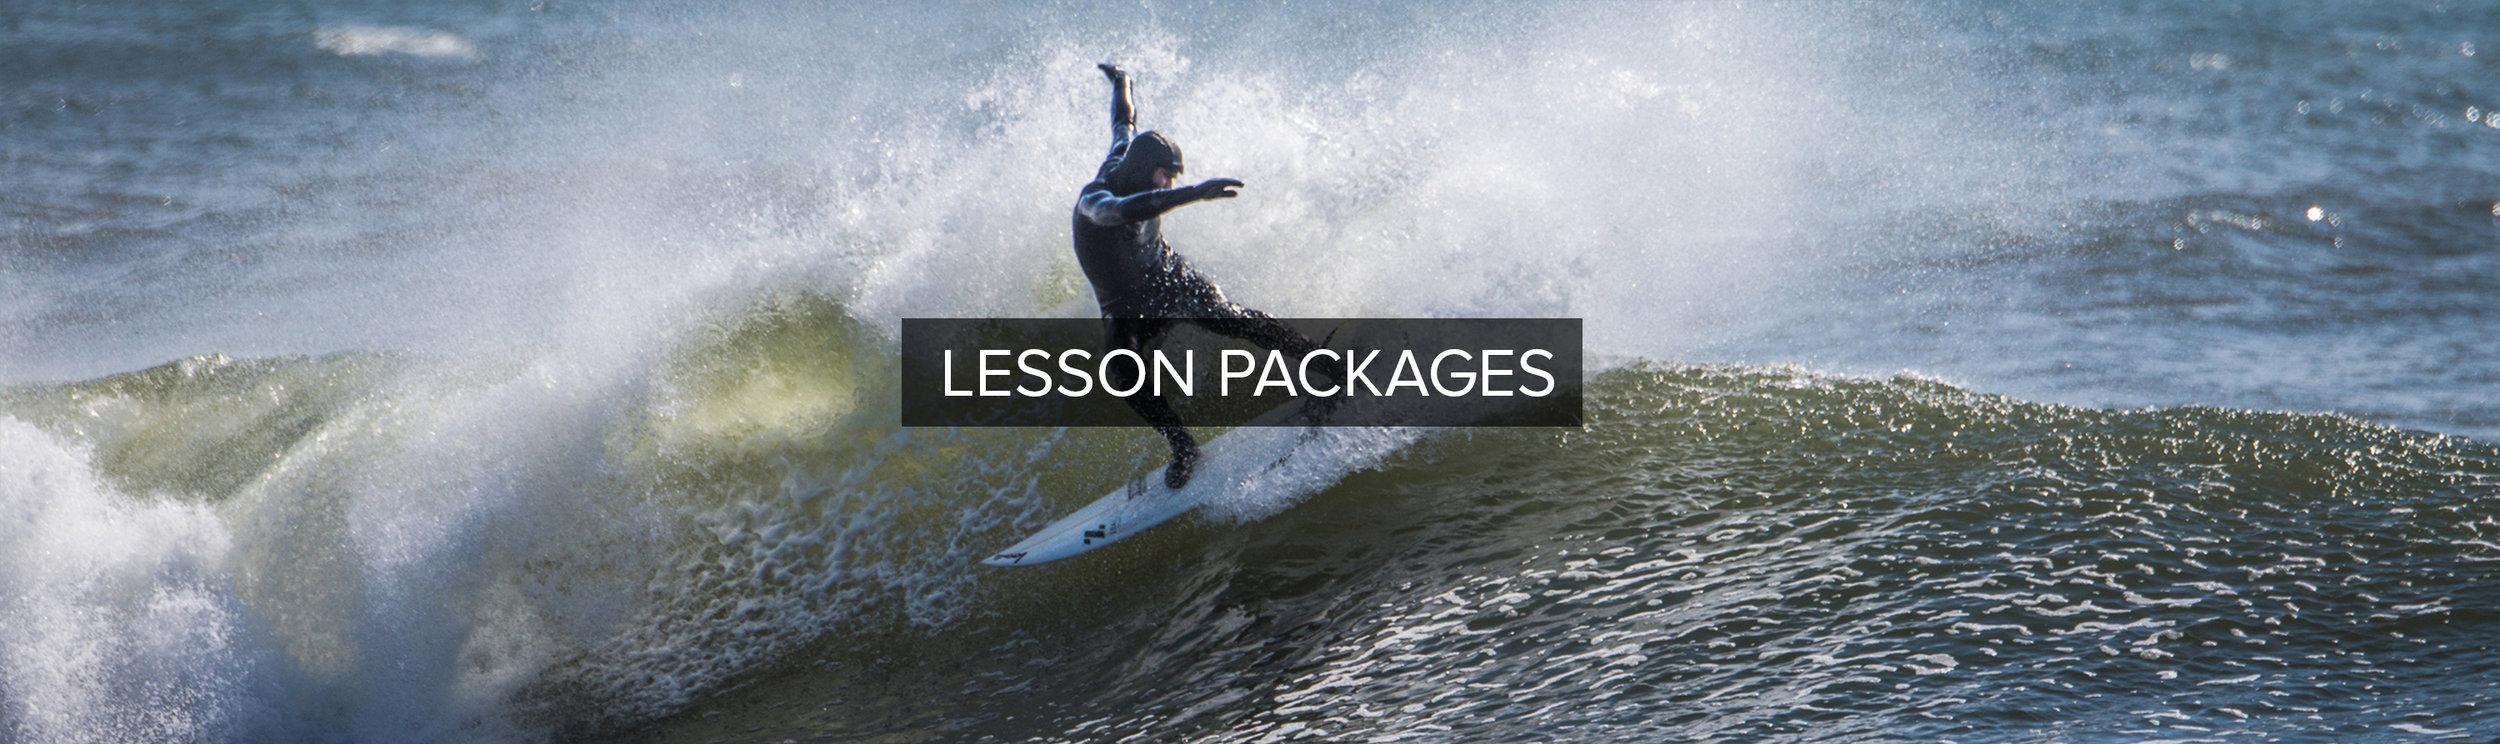 Package Slider 3.jpg